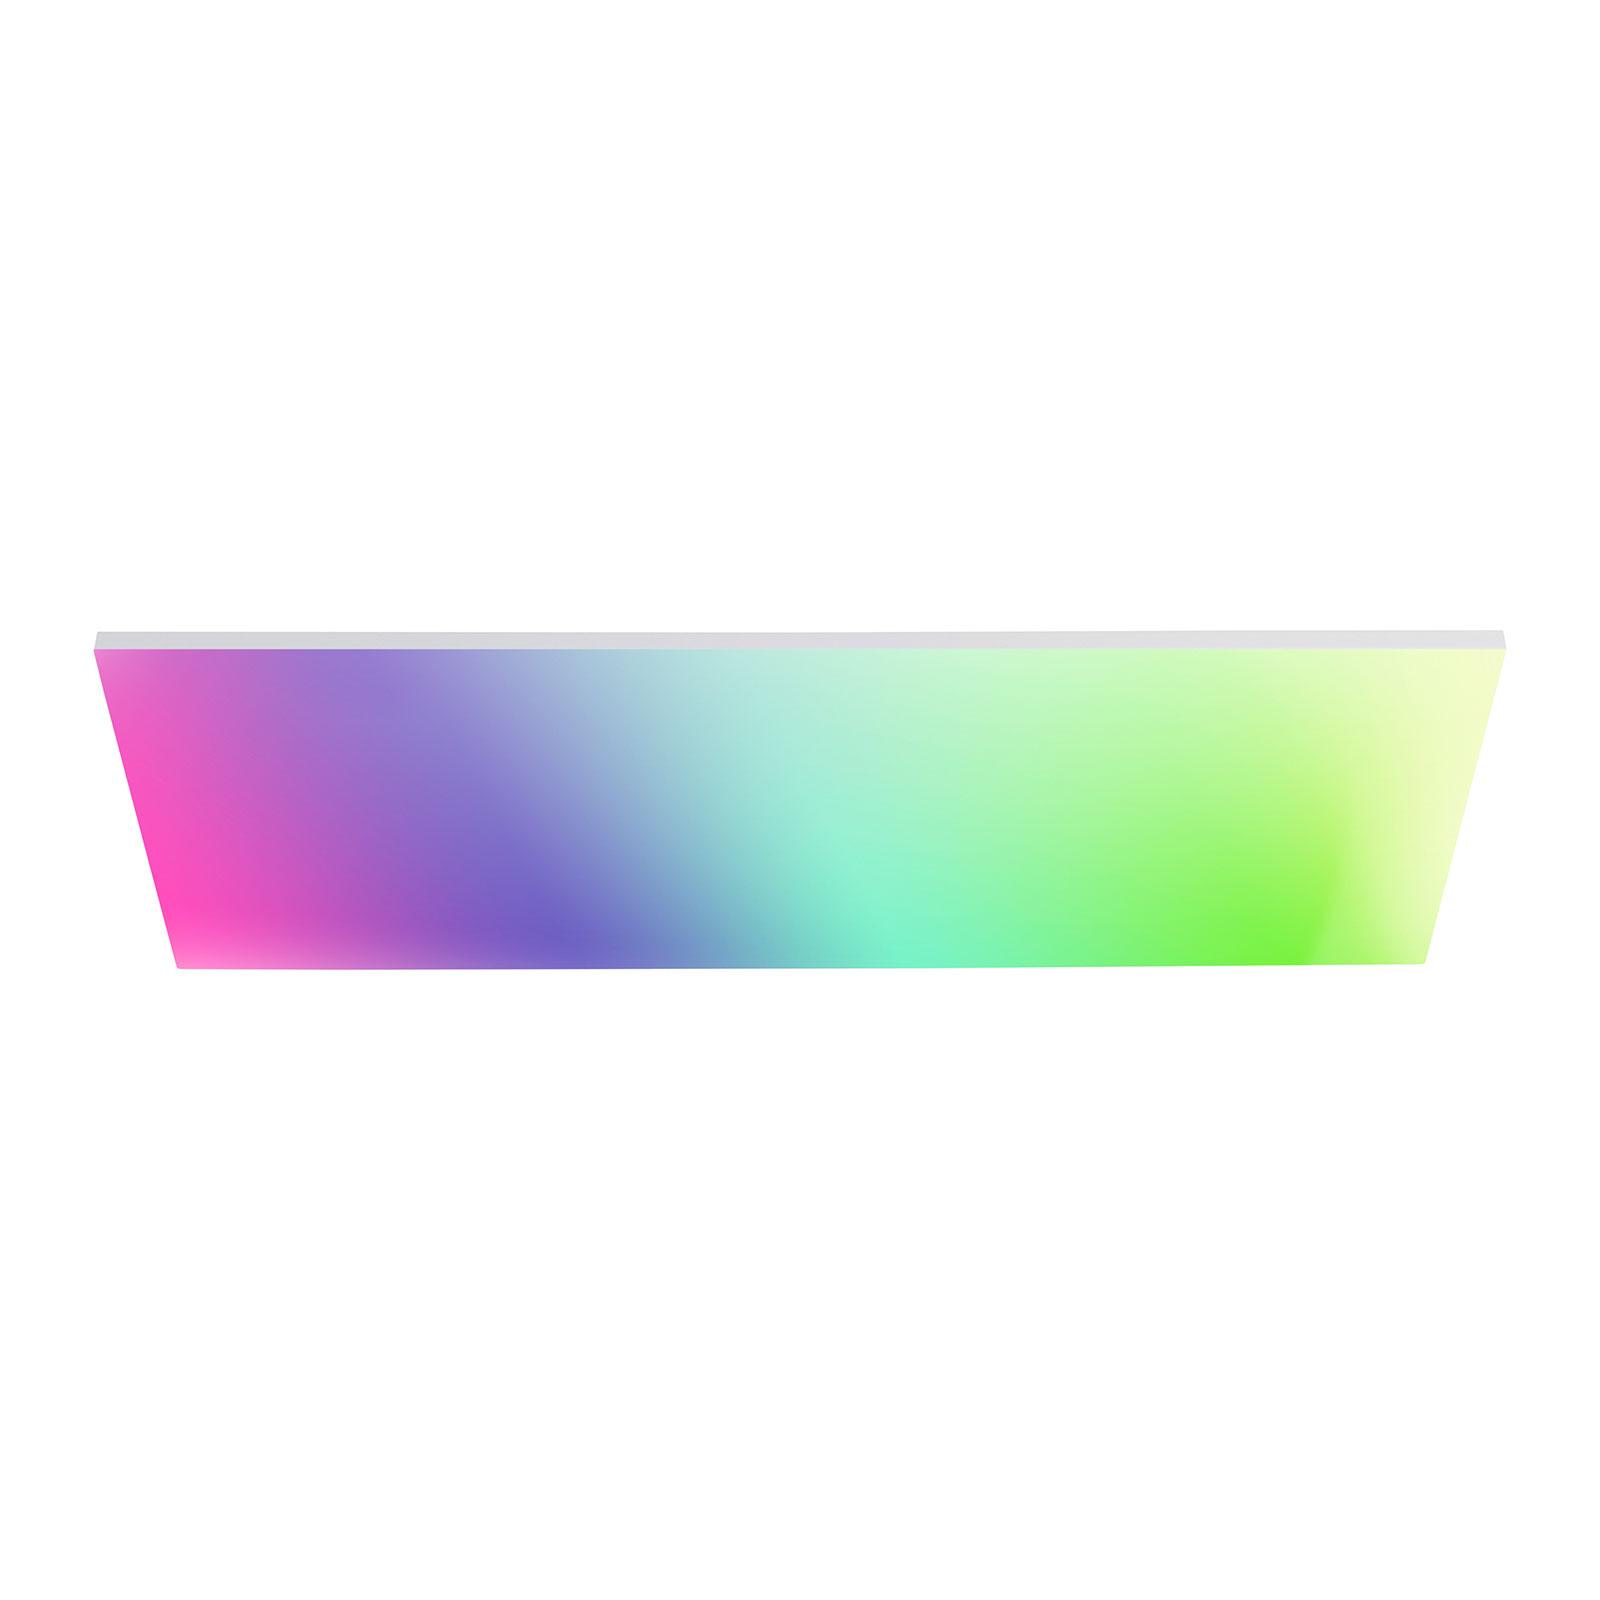 Müller Licht tint LED-panel Aris 60 x 30 cm RGBW